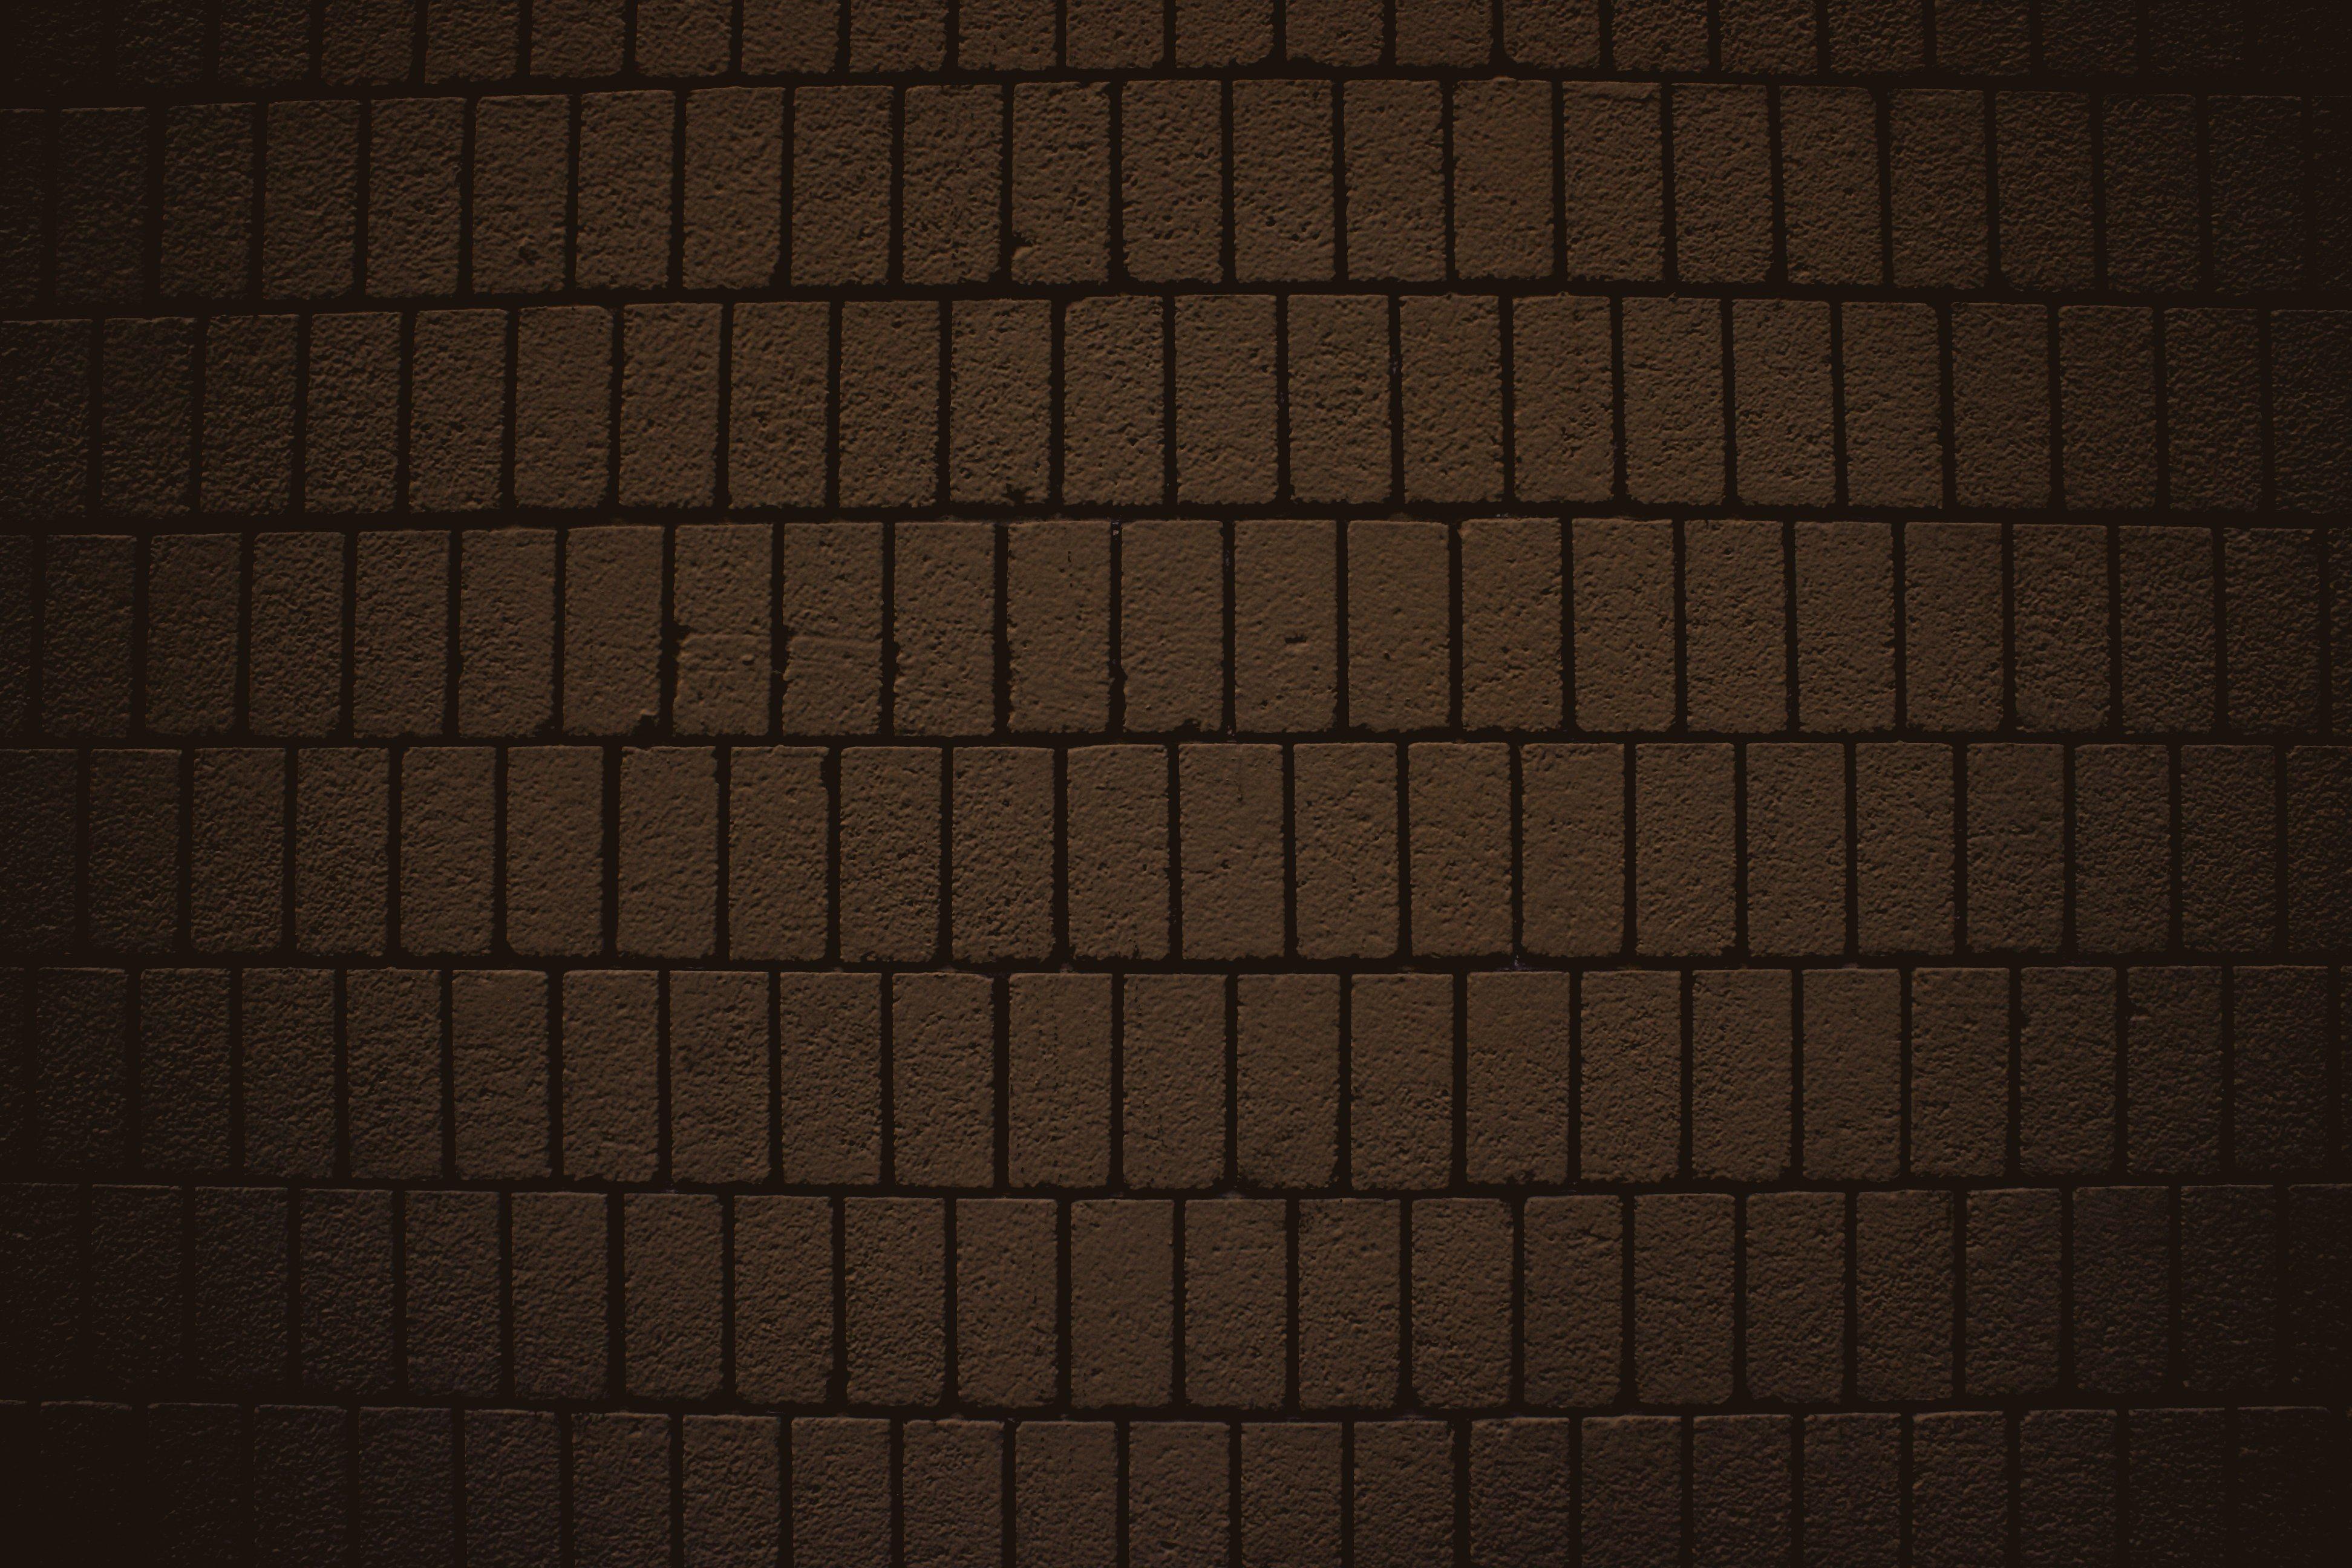 Chocolate Brown Brick Wall Texture with Vertical Bricks ...